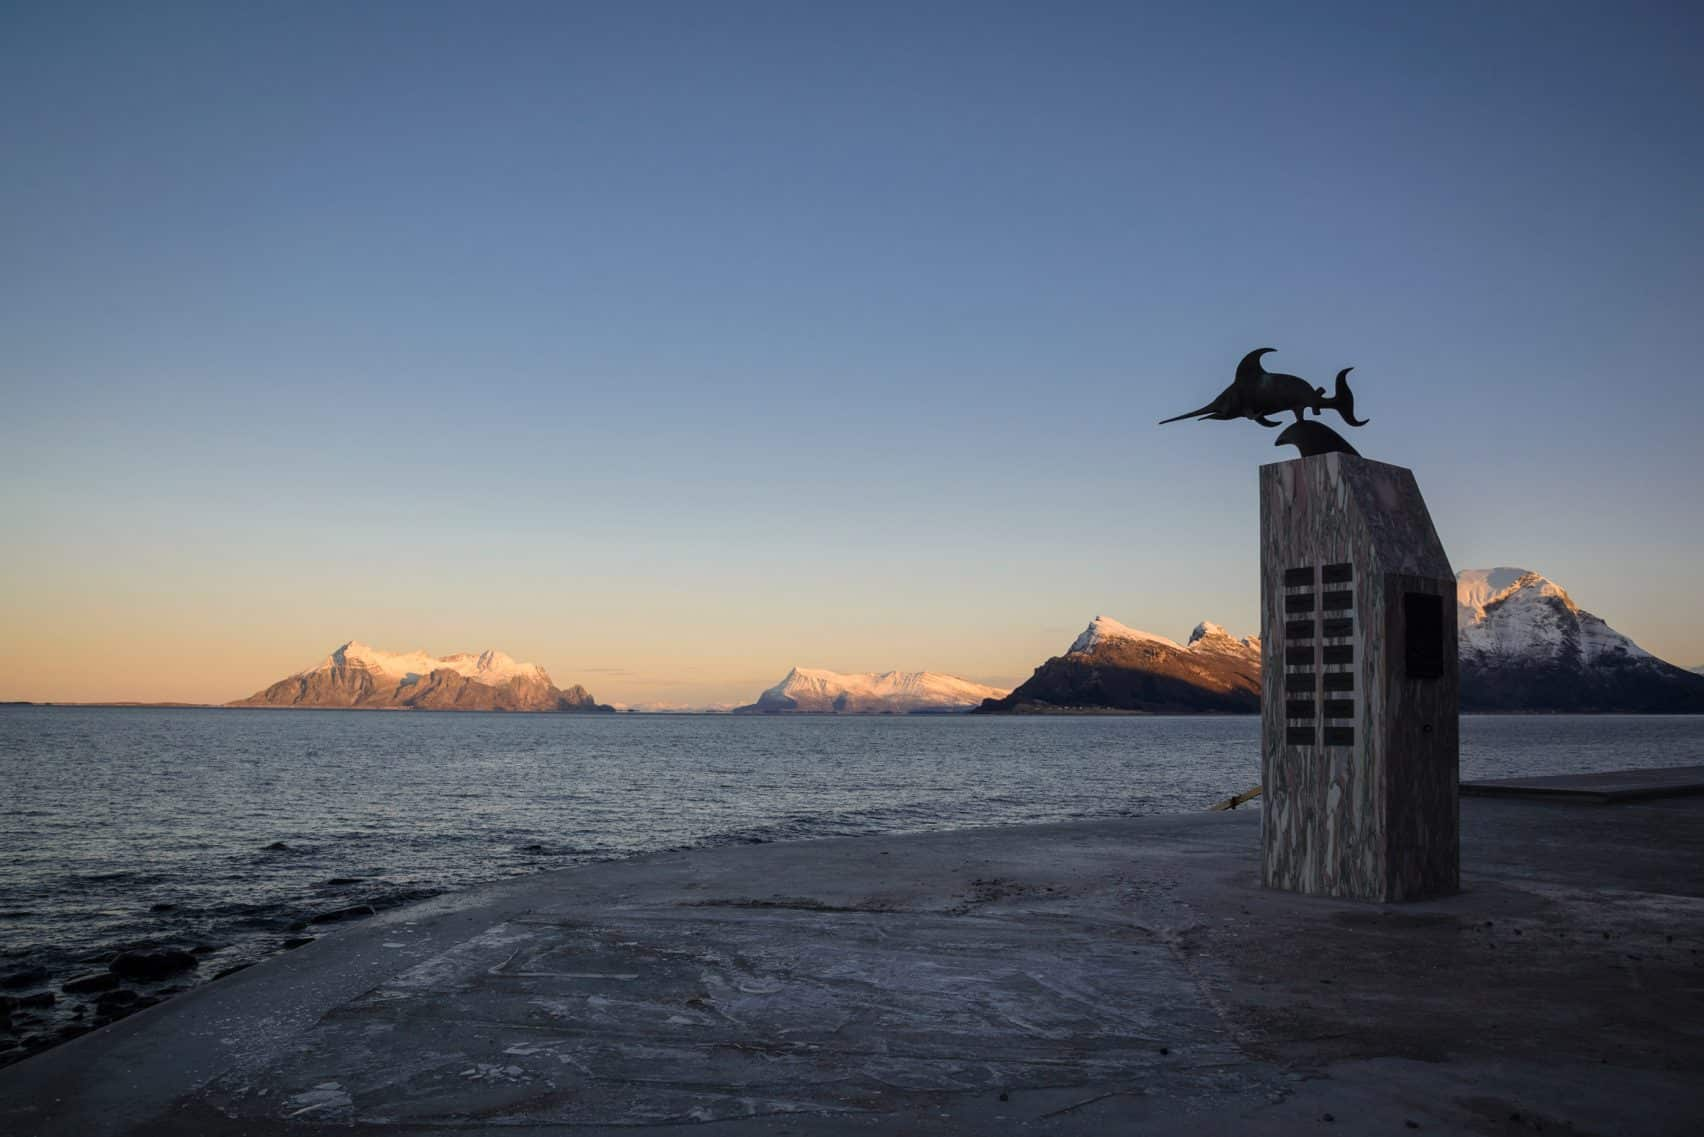 haugen zohar arkitekter hza wave shaped toilet facility norwegian scenic route 5